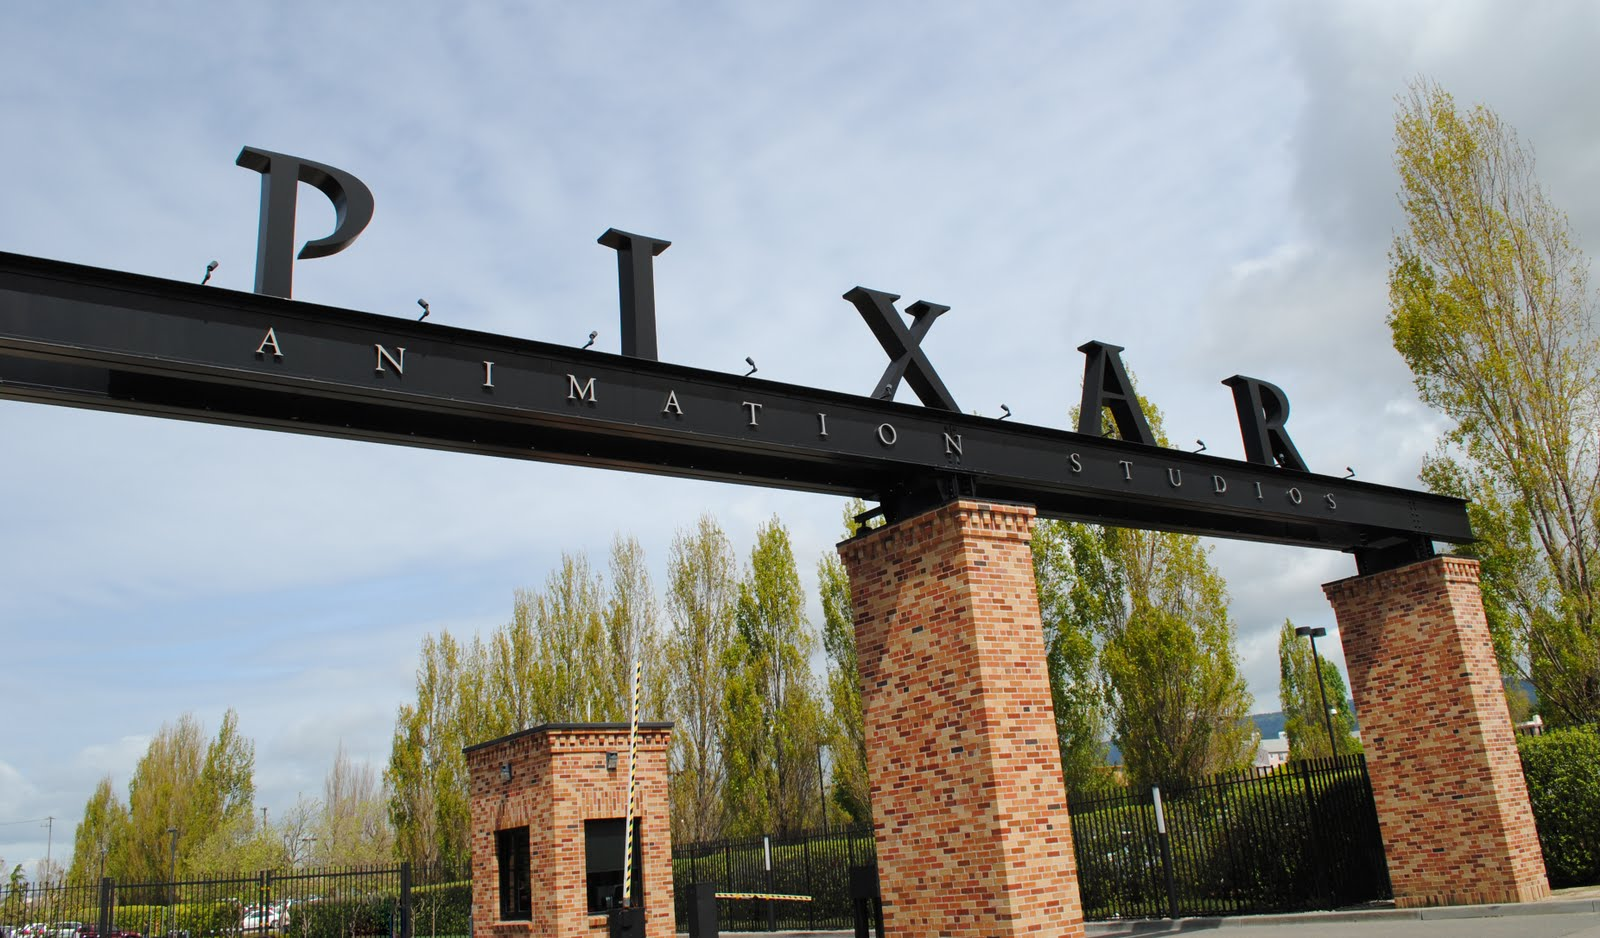 Pixar's front gate, Emeryville, CA